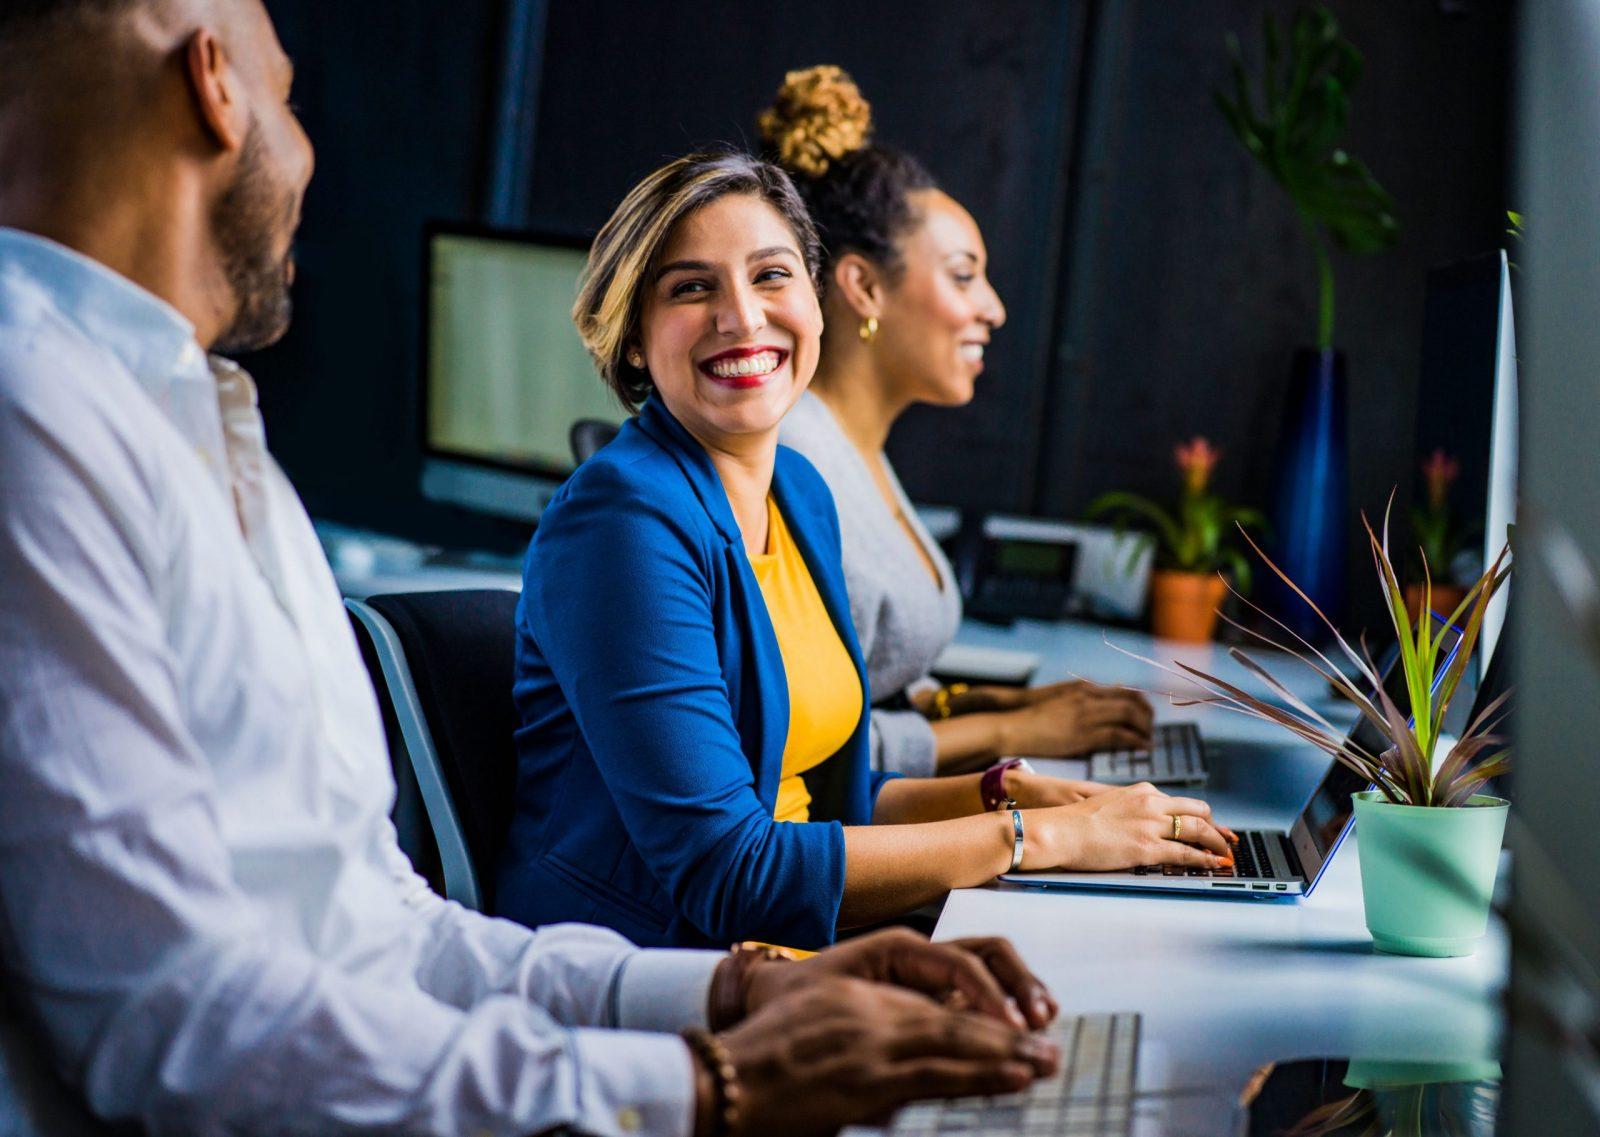 5 Wellness Resolutions for Entrepreneurs this 2020 - People Development Network